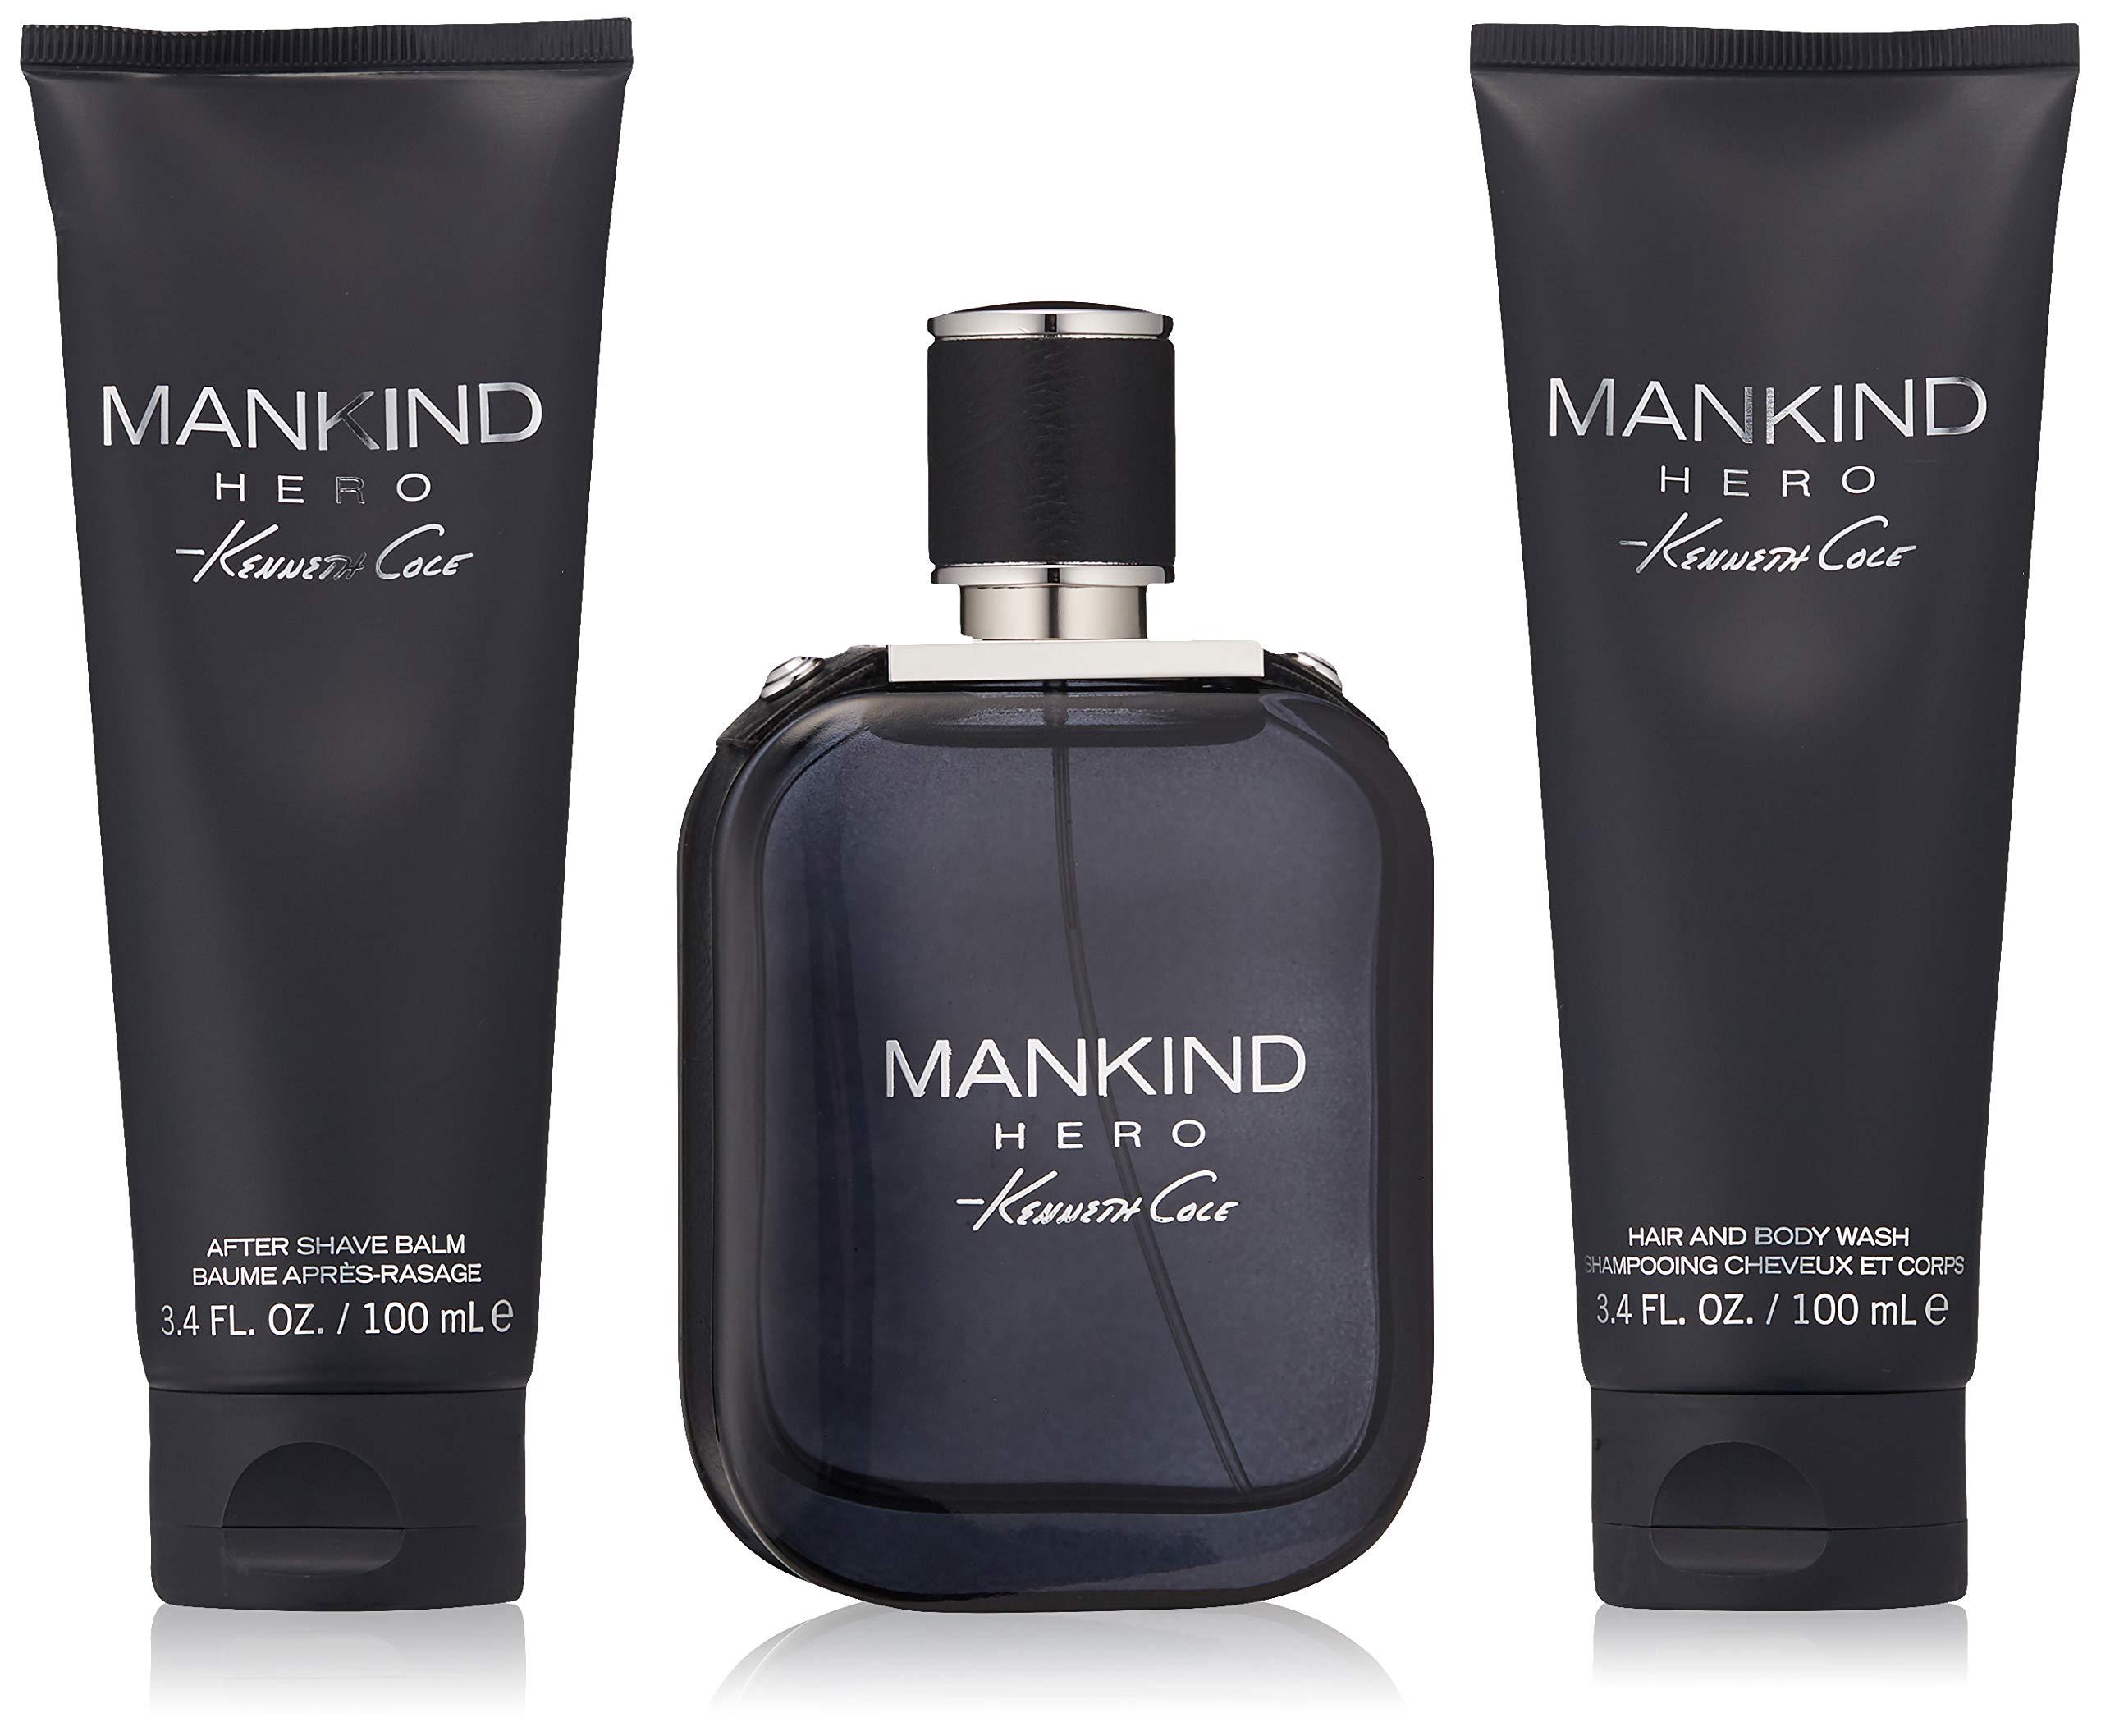 Kenneth Cole 3 Piece Mankind Hero Gift Set, 3.4 Oz.